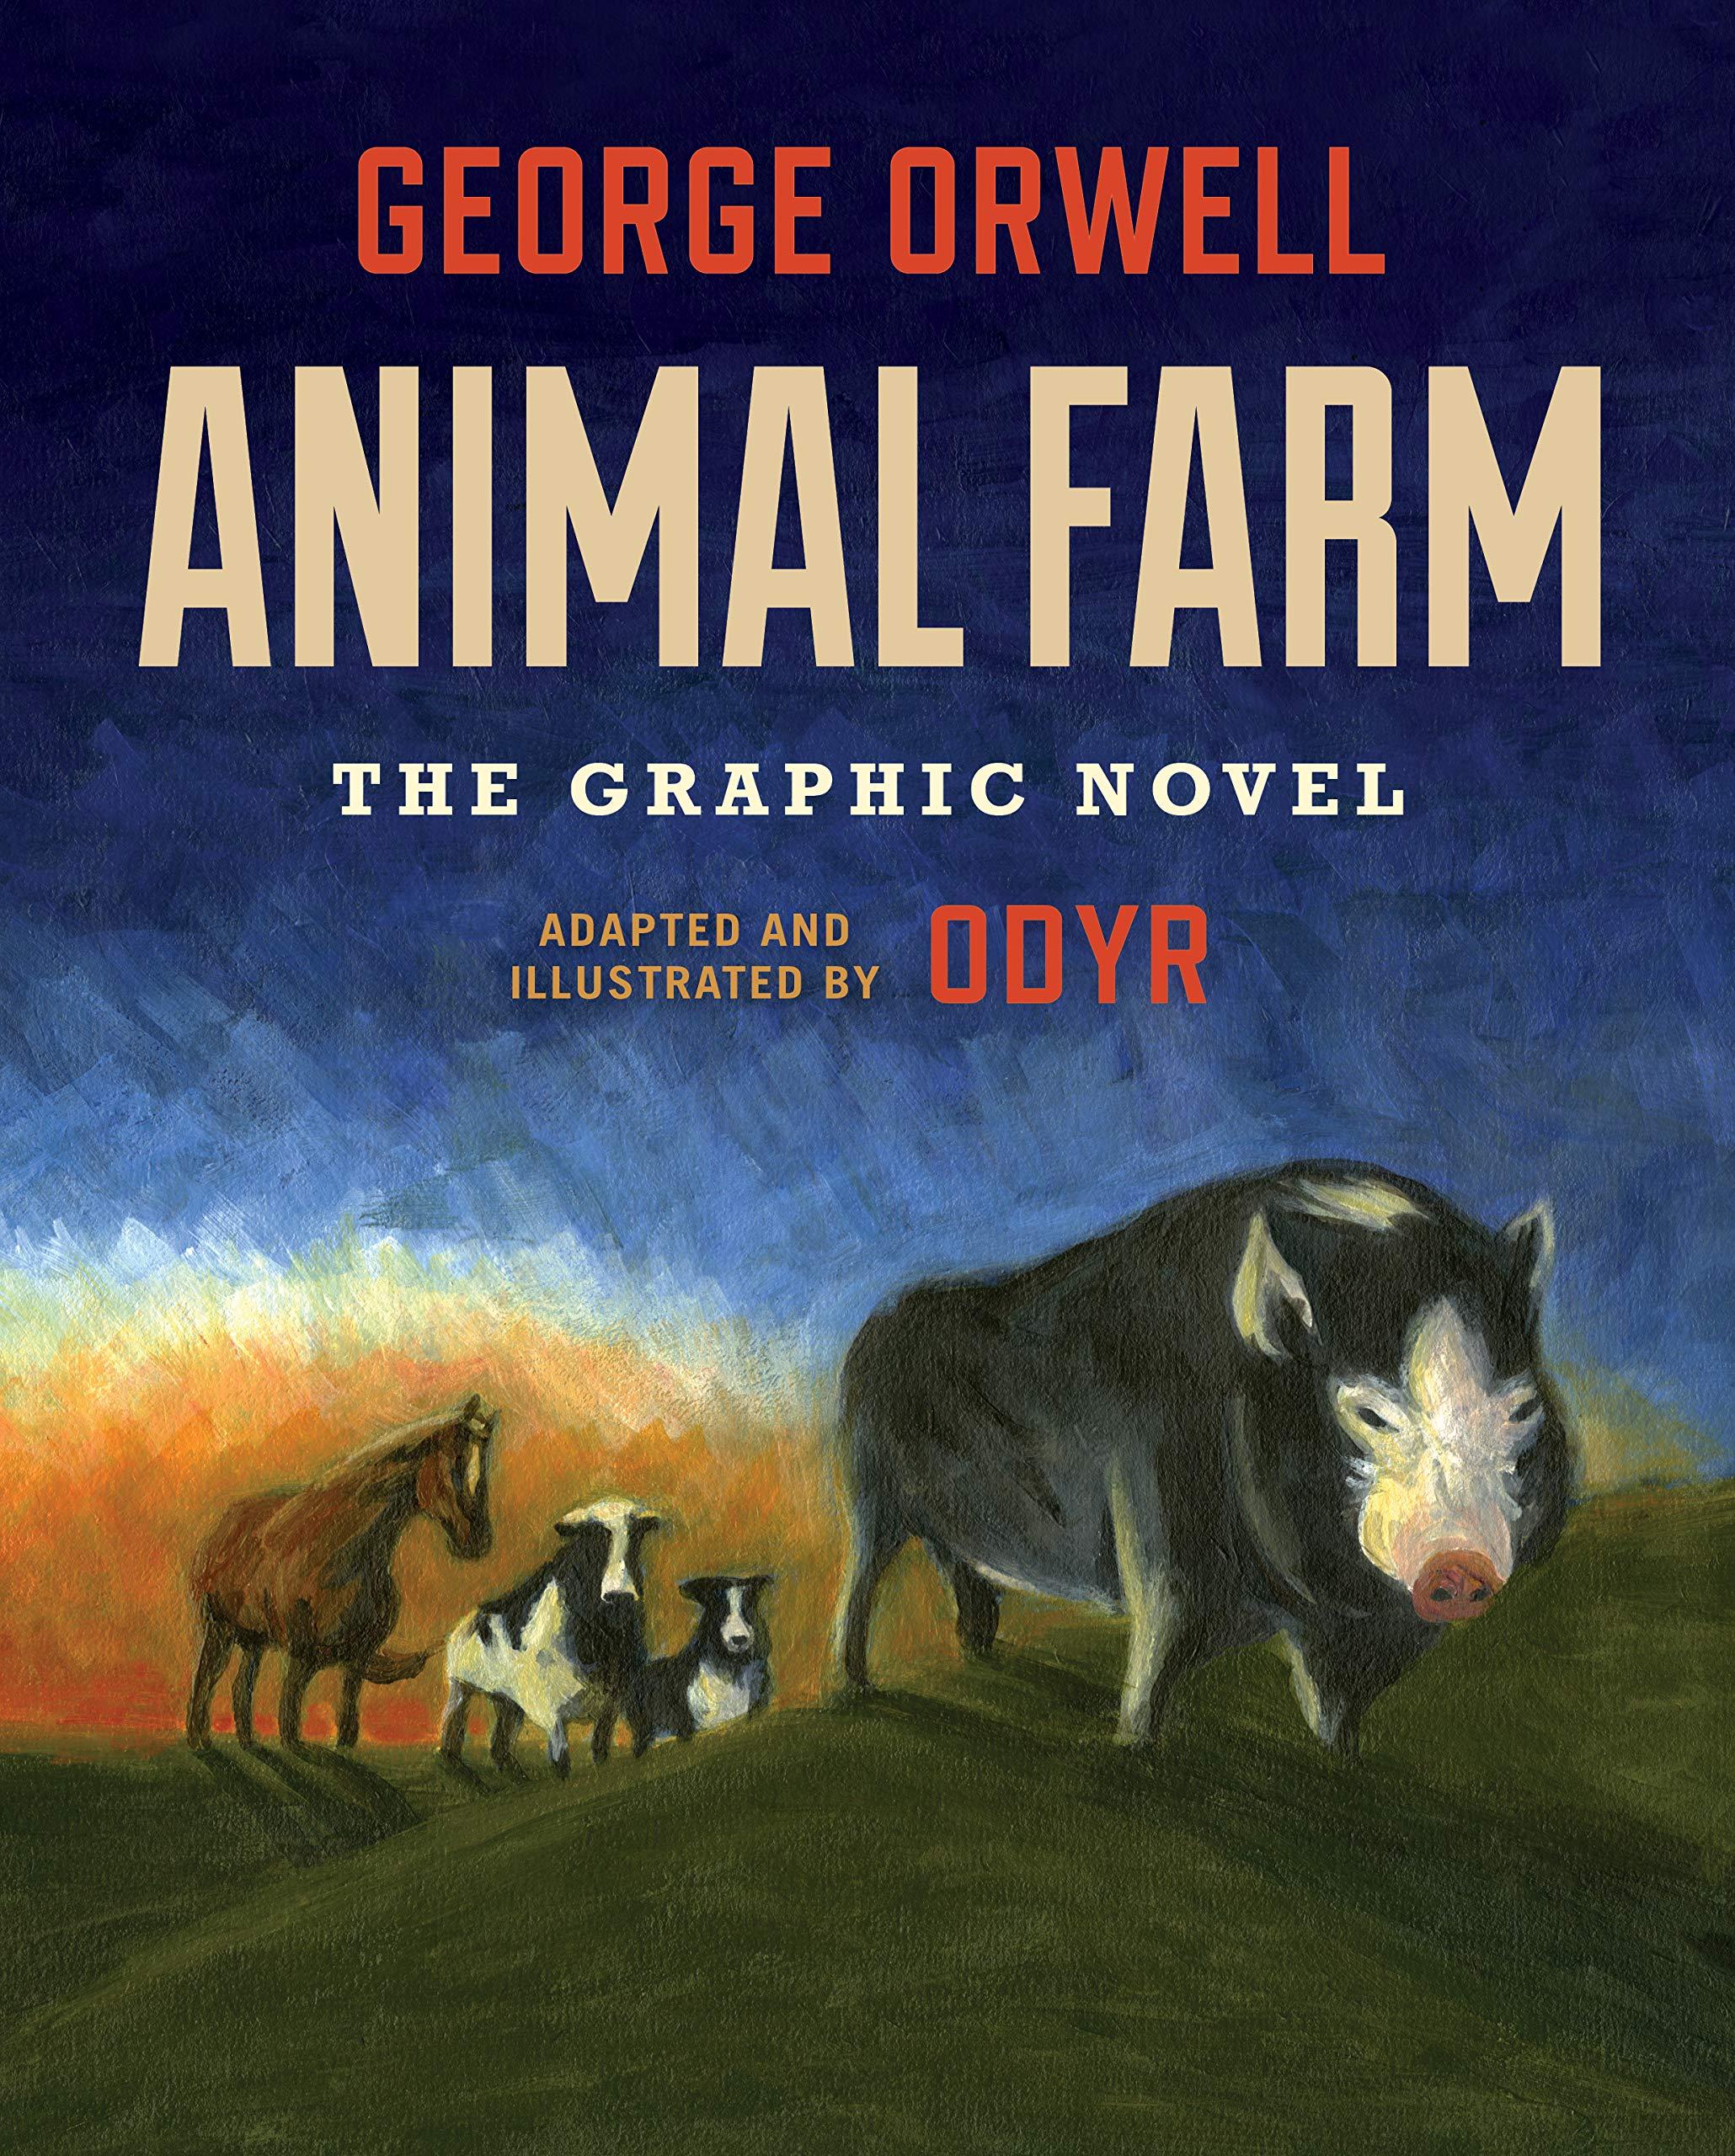 Animal Farm graphic novel cover